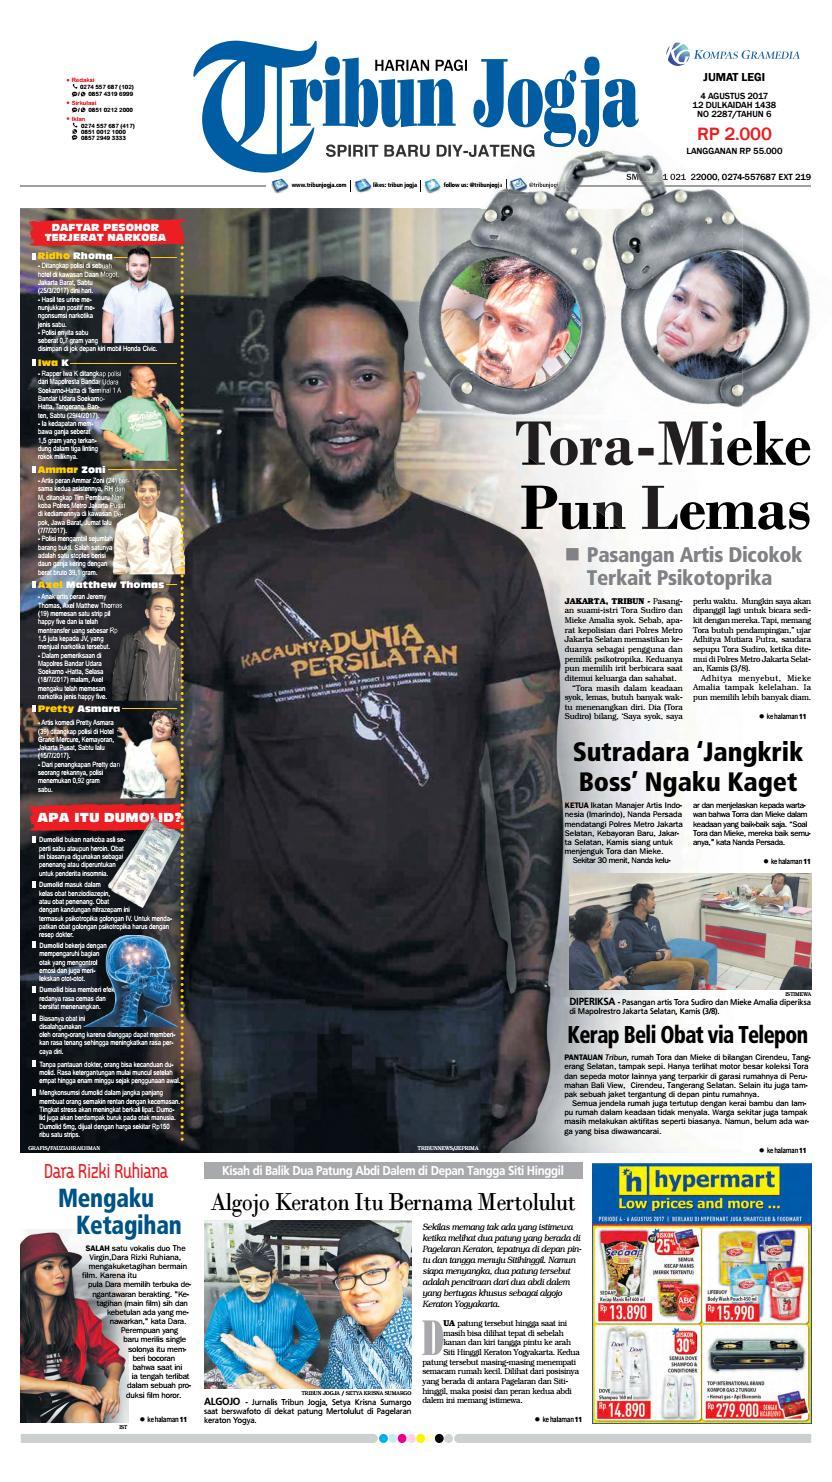 Tribunjogja 04 08 2017 By Tribun Jogja Issuu Snack Gayem Pangsit Bantal Imut Bdg